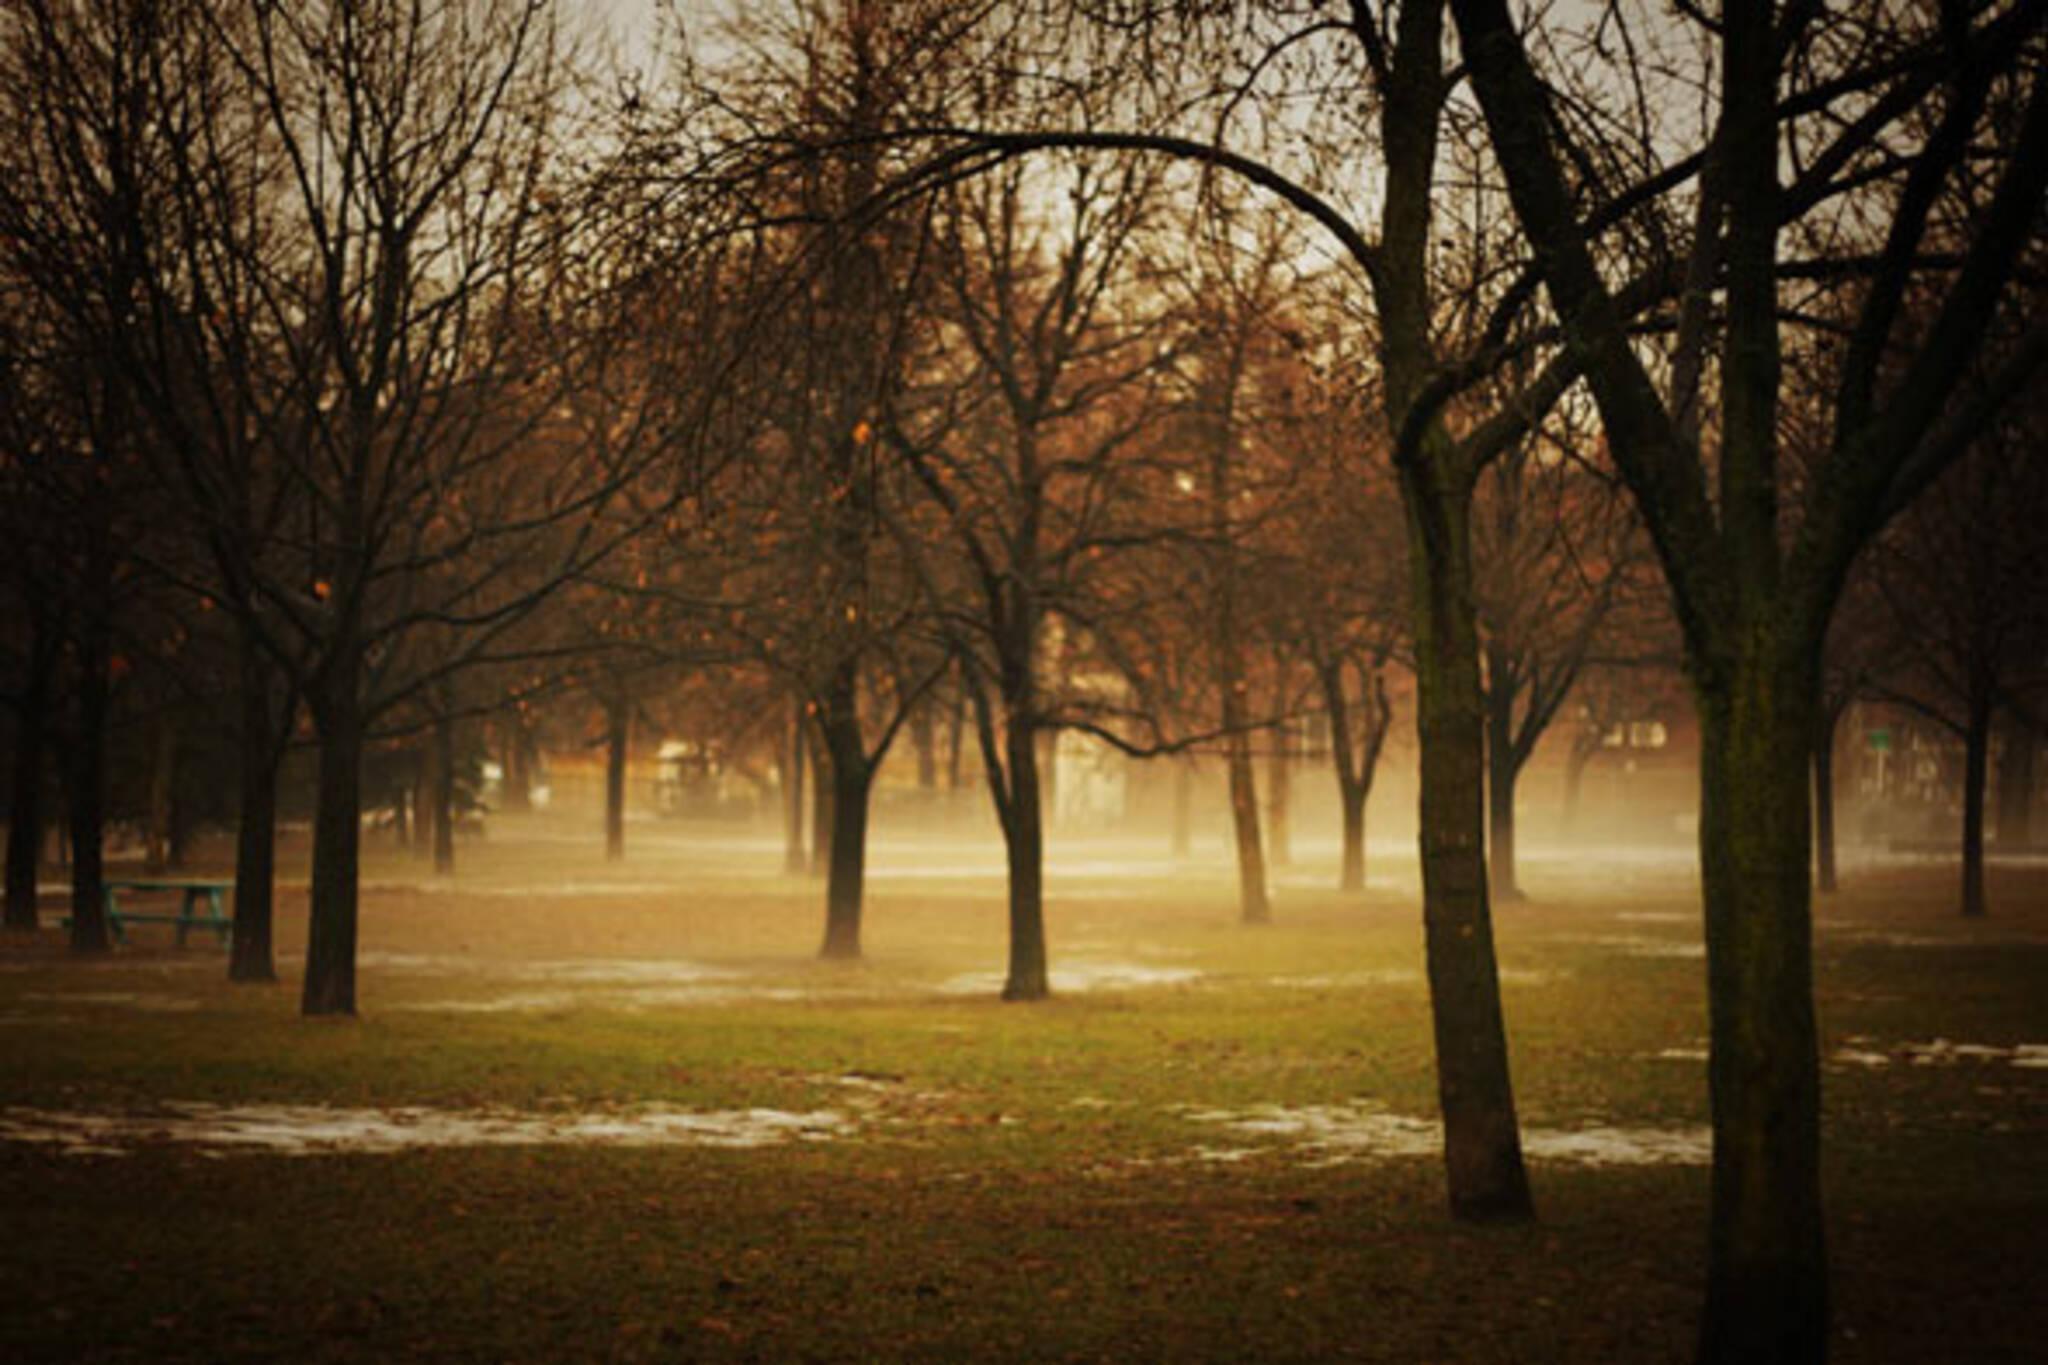 trees settle